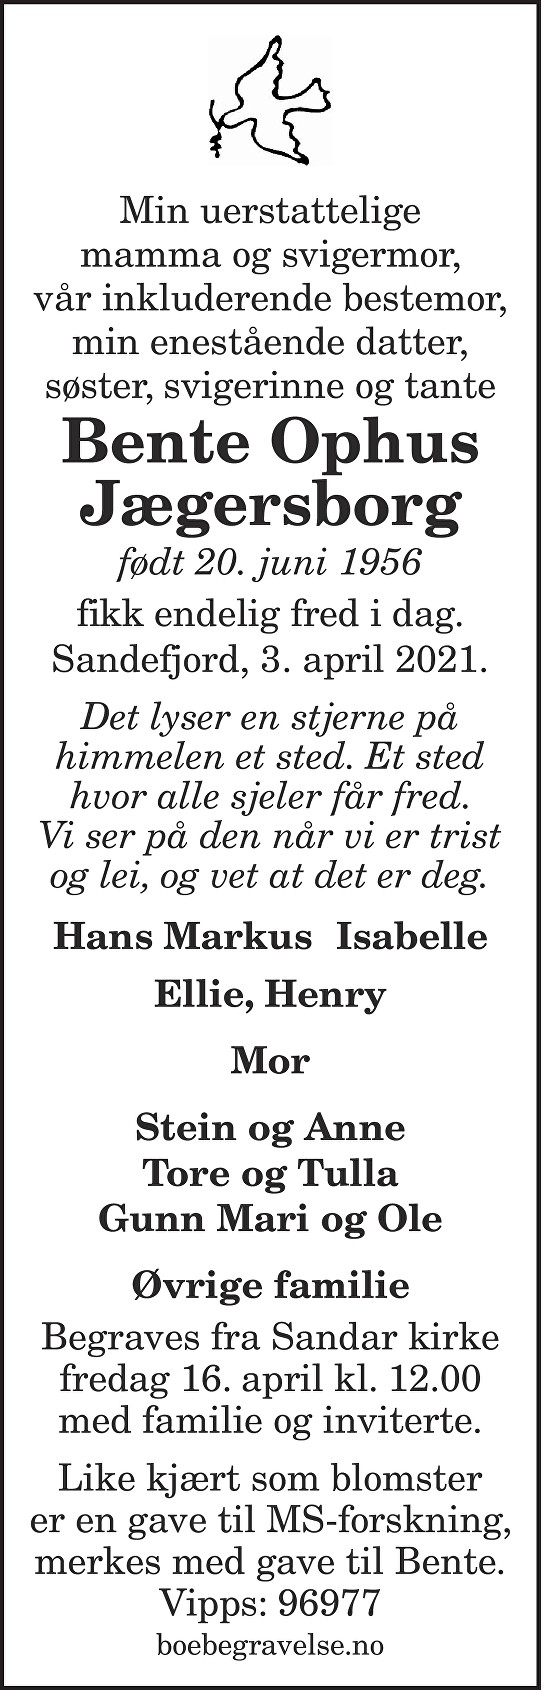 Bente Ophus Jægersborg Dødsannonse